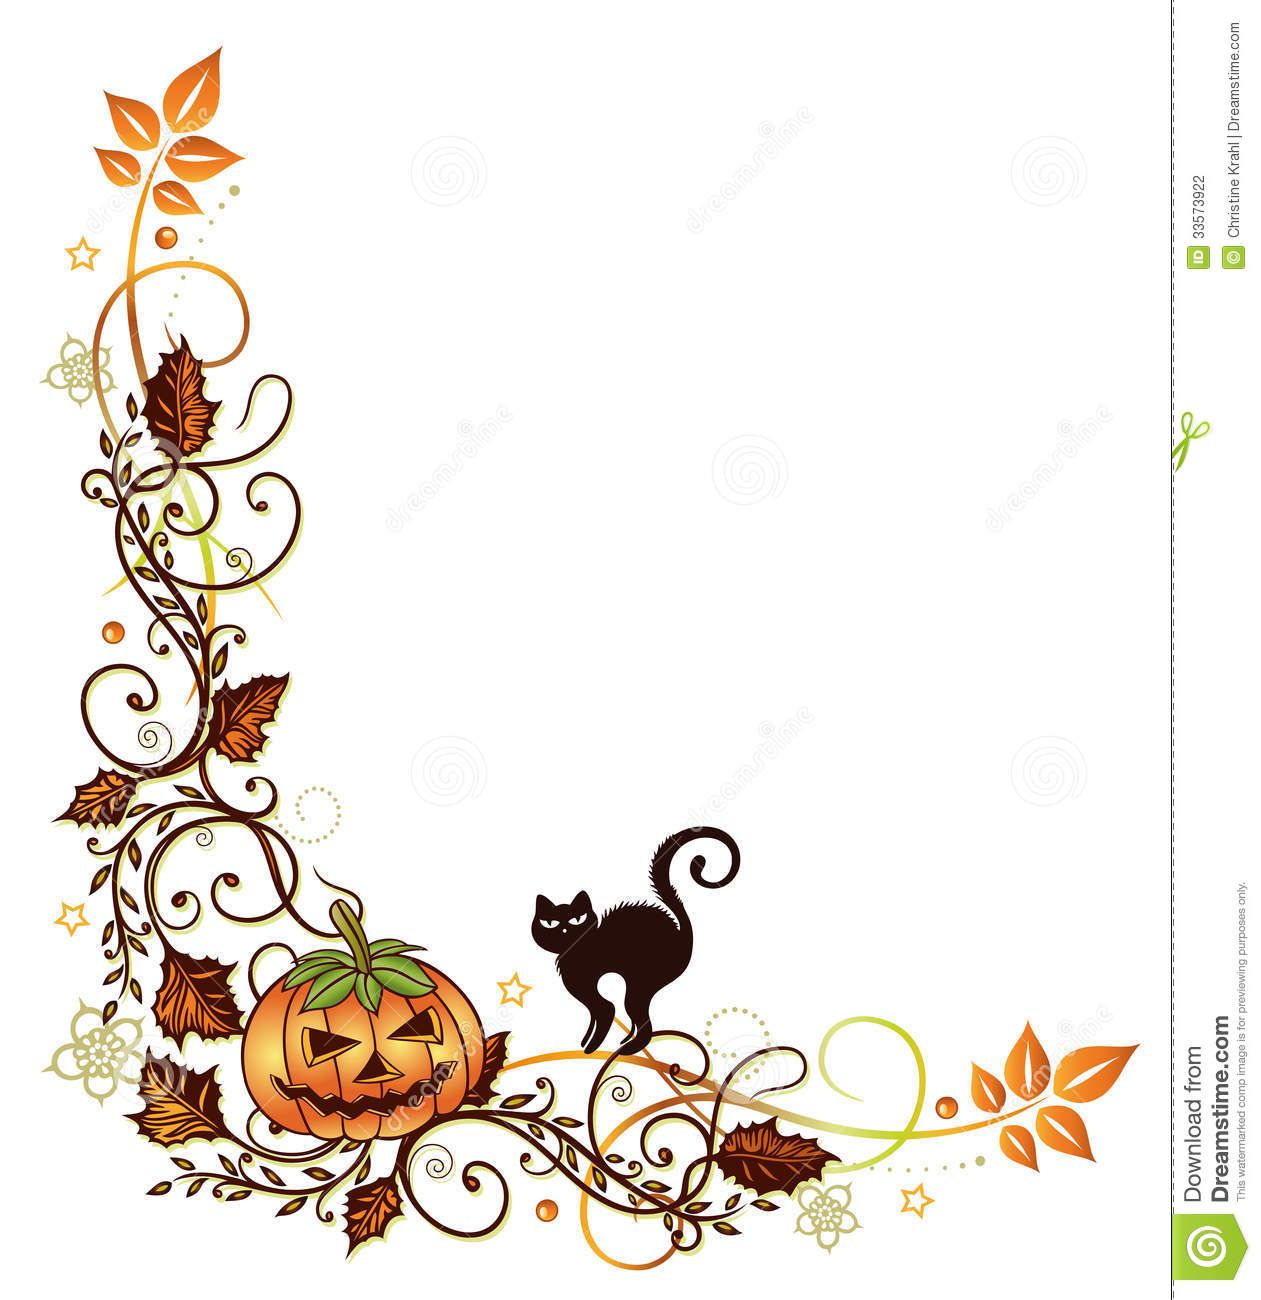 medium resolution of halloween border clipart free large images